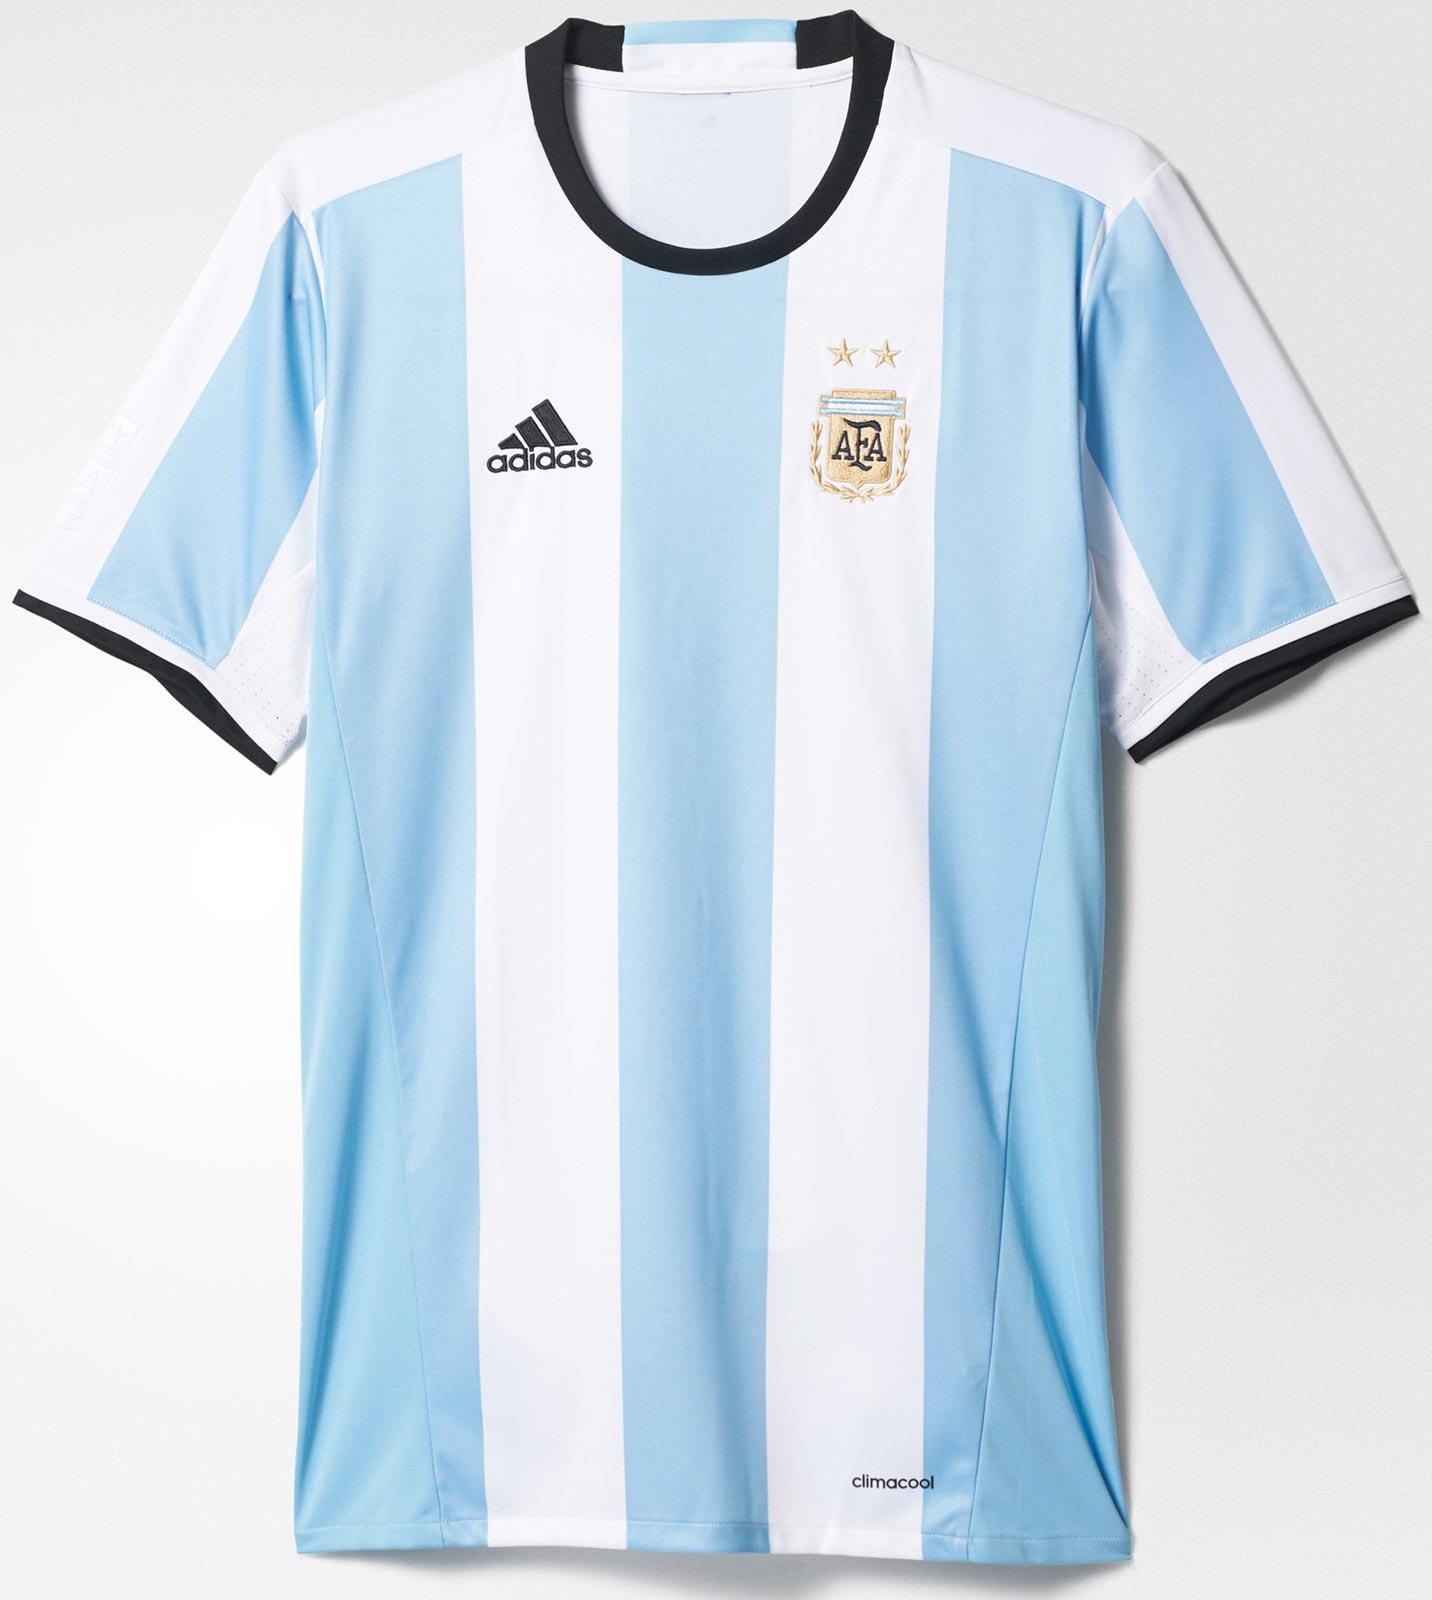 a59d08e79d0b Design Your Own Adidas Football Shirt - BCD Tofu House